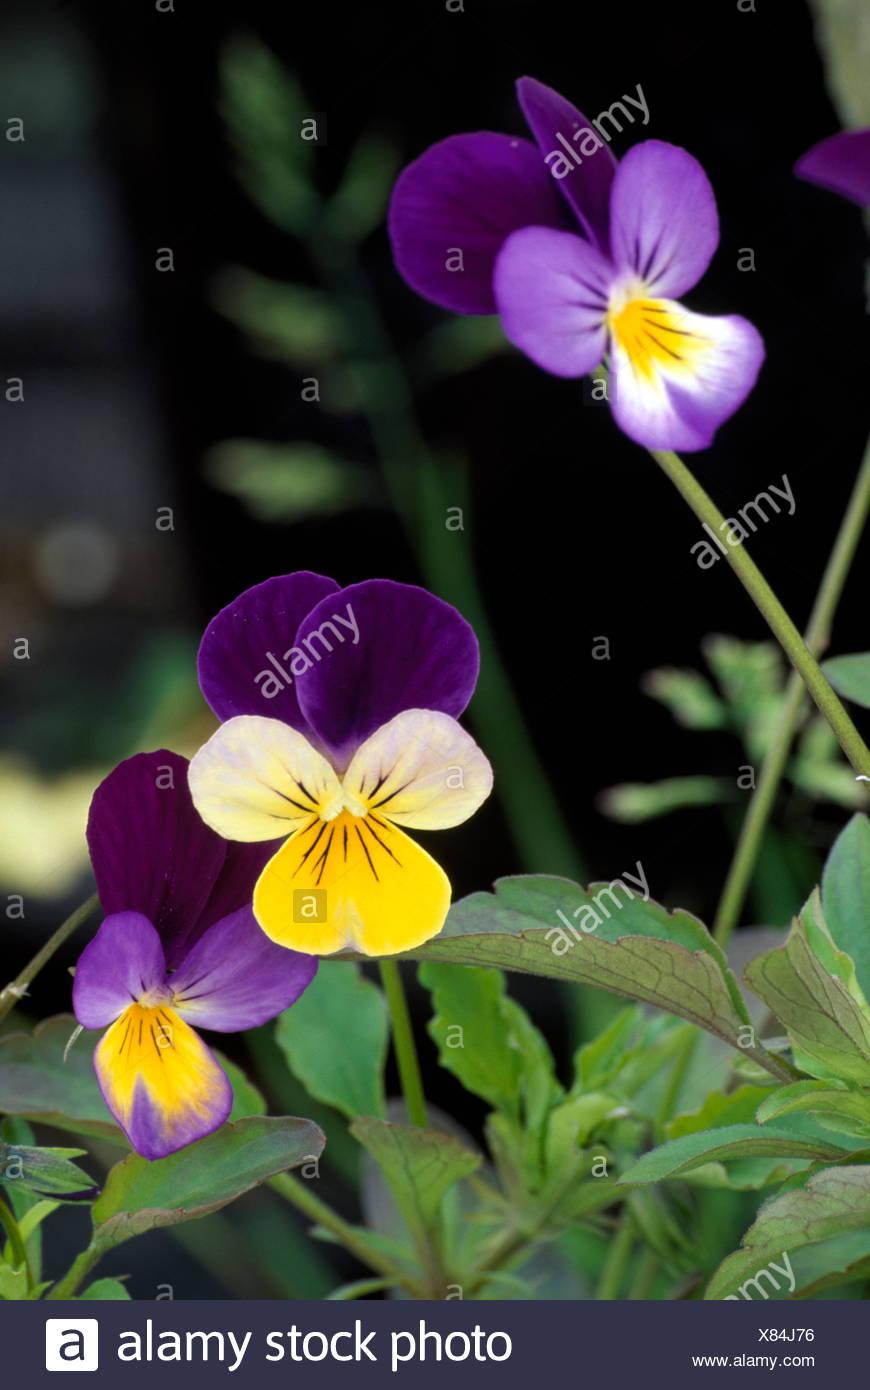 Close-up of mauve+yellow perennials violas - Stock Image